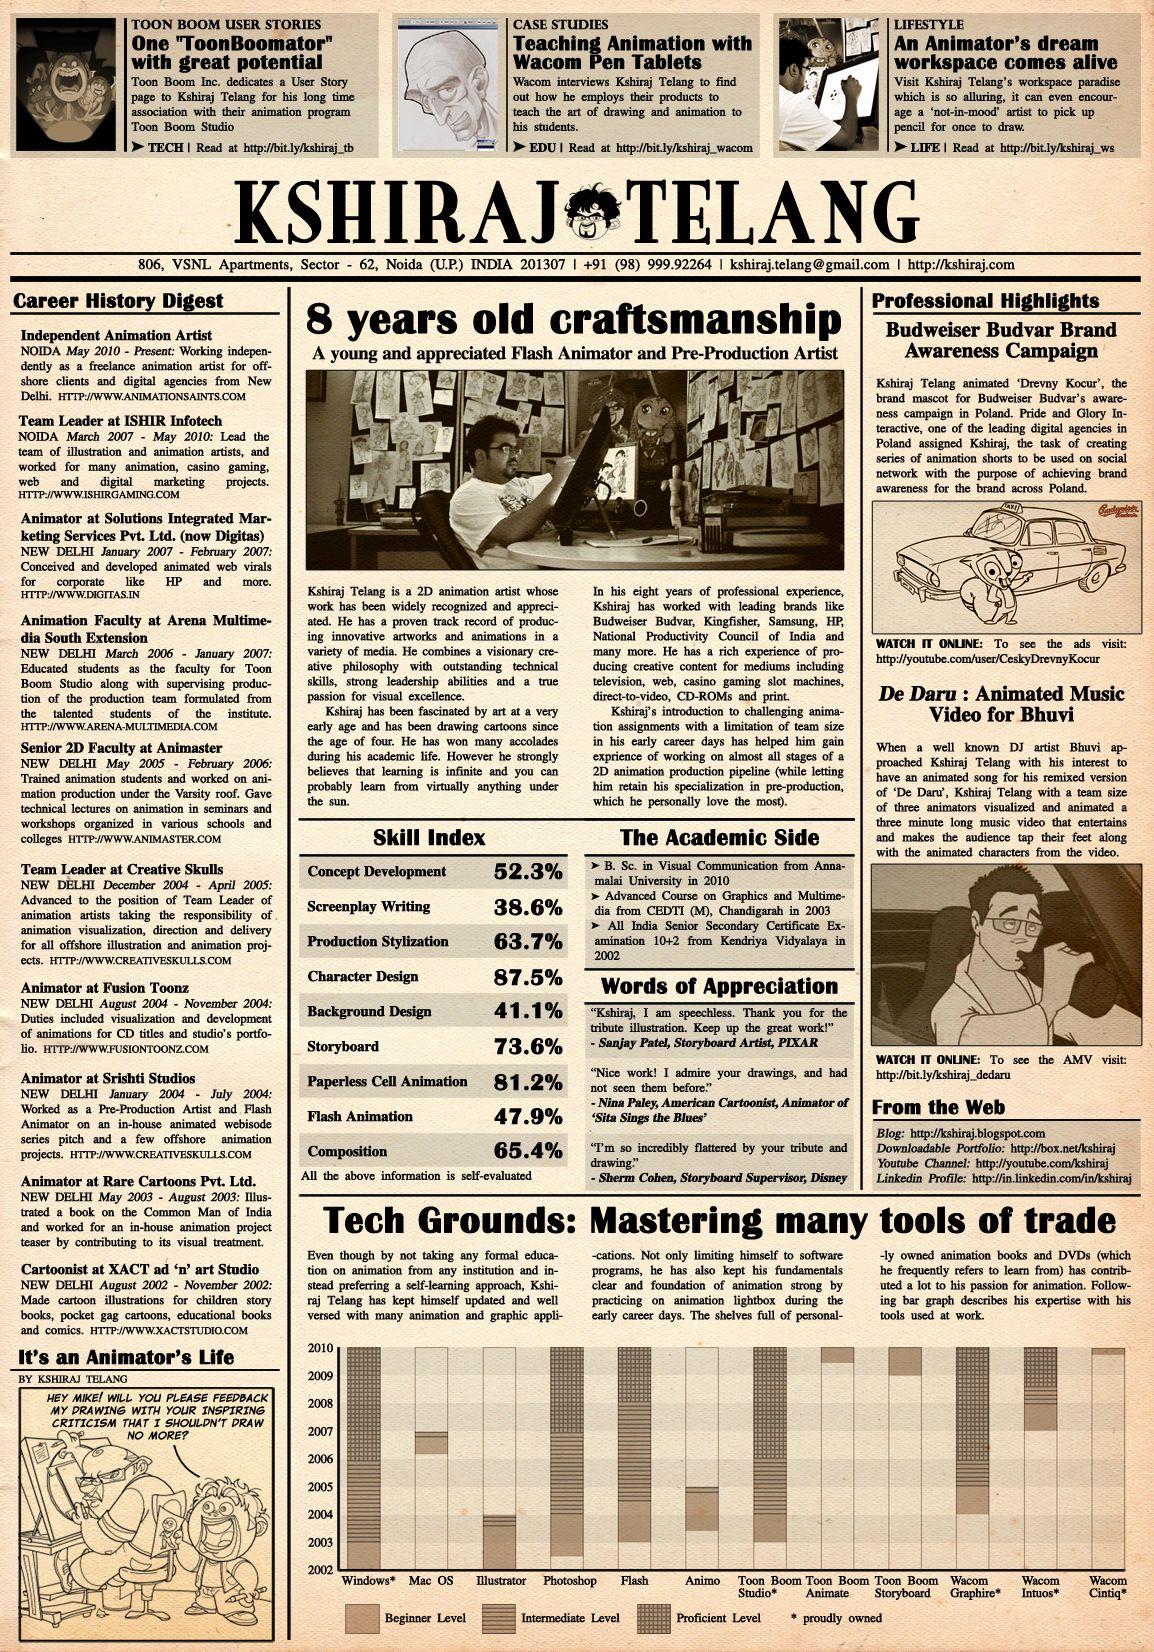 Creative Futures Web Design Sarahesparrow Page 5